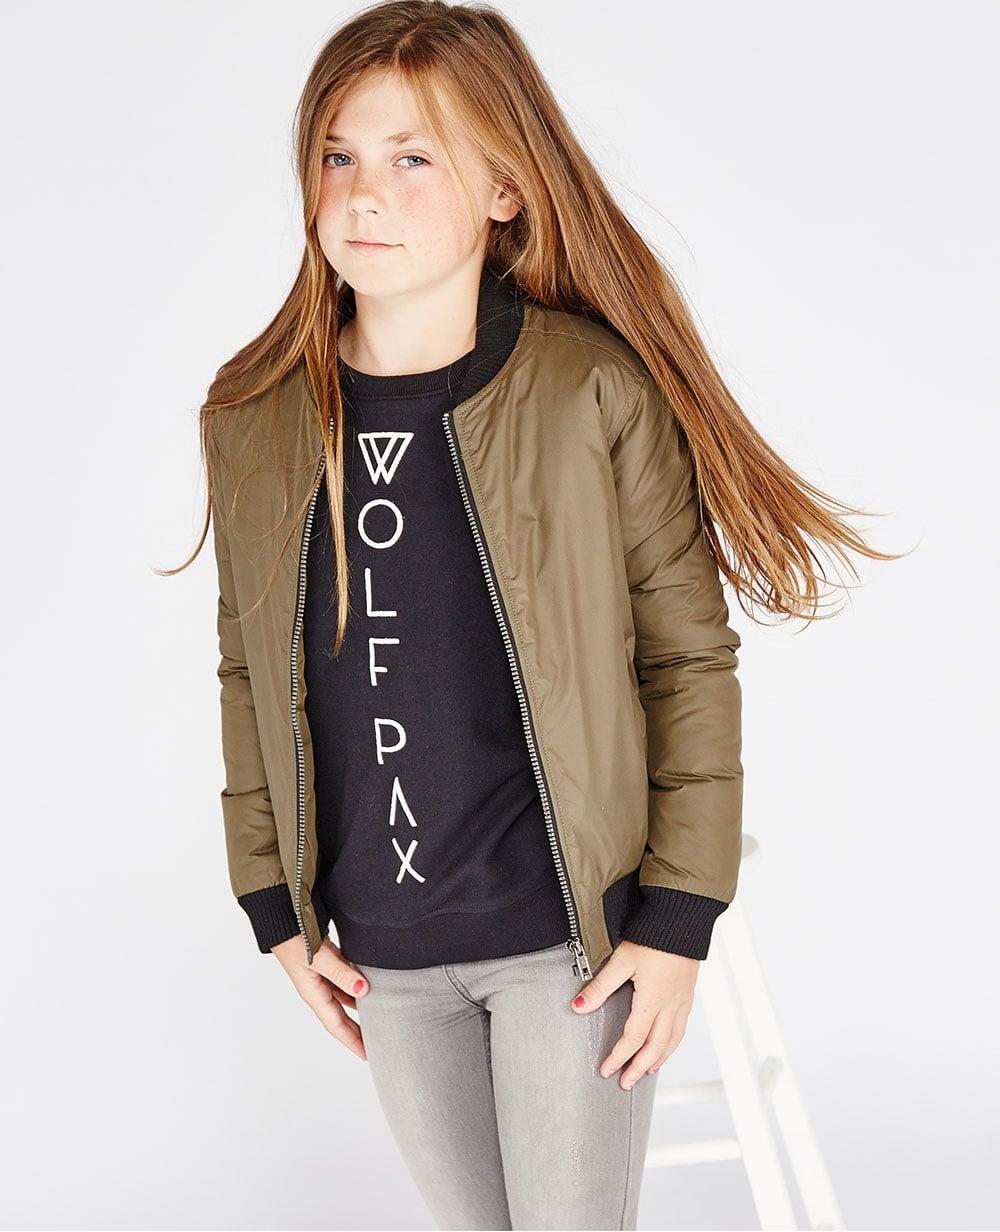 Wolf Pax Kids Girls Bomber Jacket Khaki Green Baseball Neckline ...